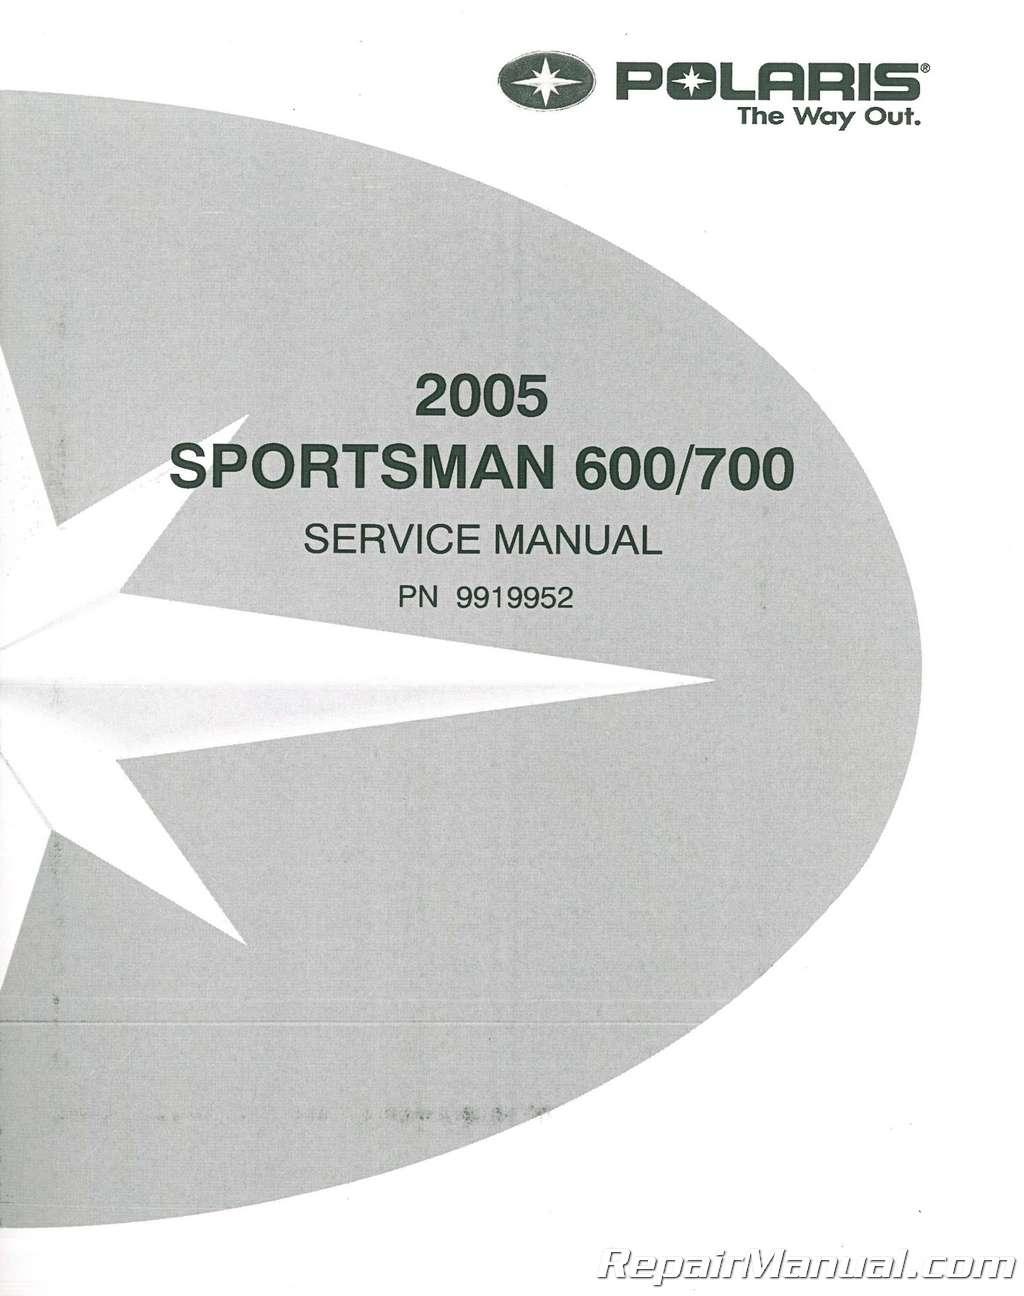 2005 Polaris Sportsman 600 700 Twin Service Manual Wiring Diagram